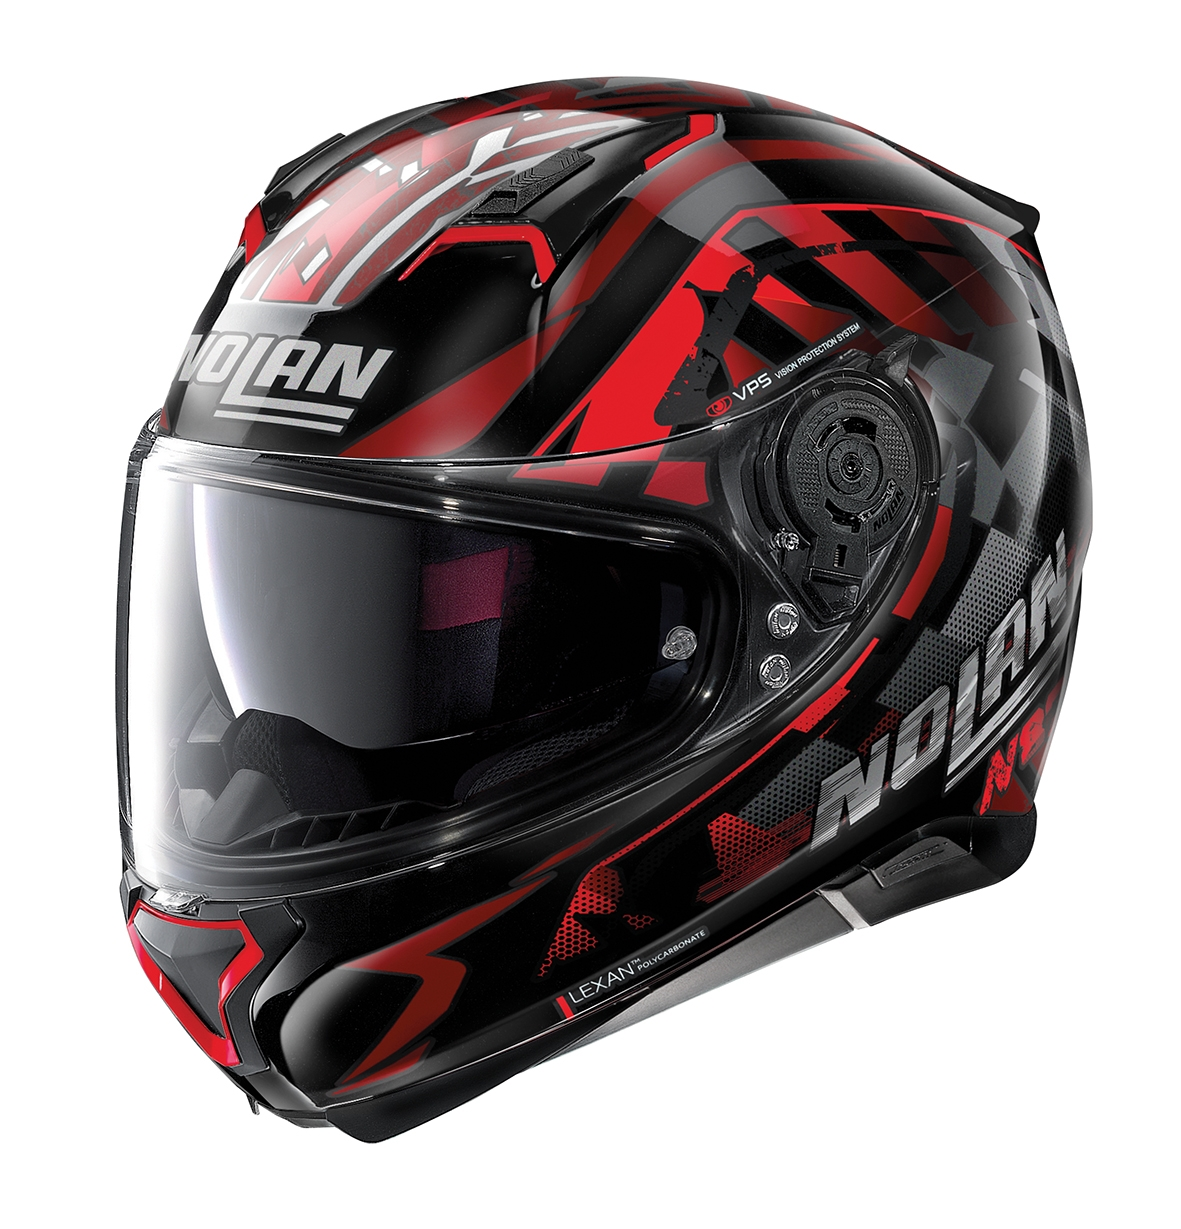 Moto helma Nolan N87 Venator N-Com 89 červená